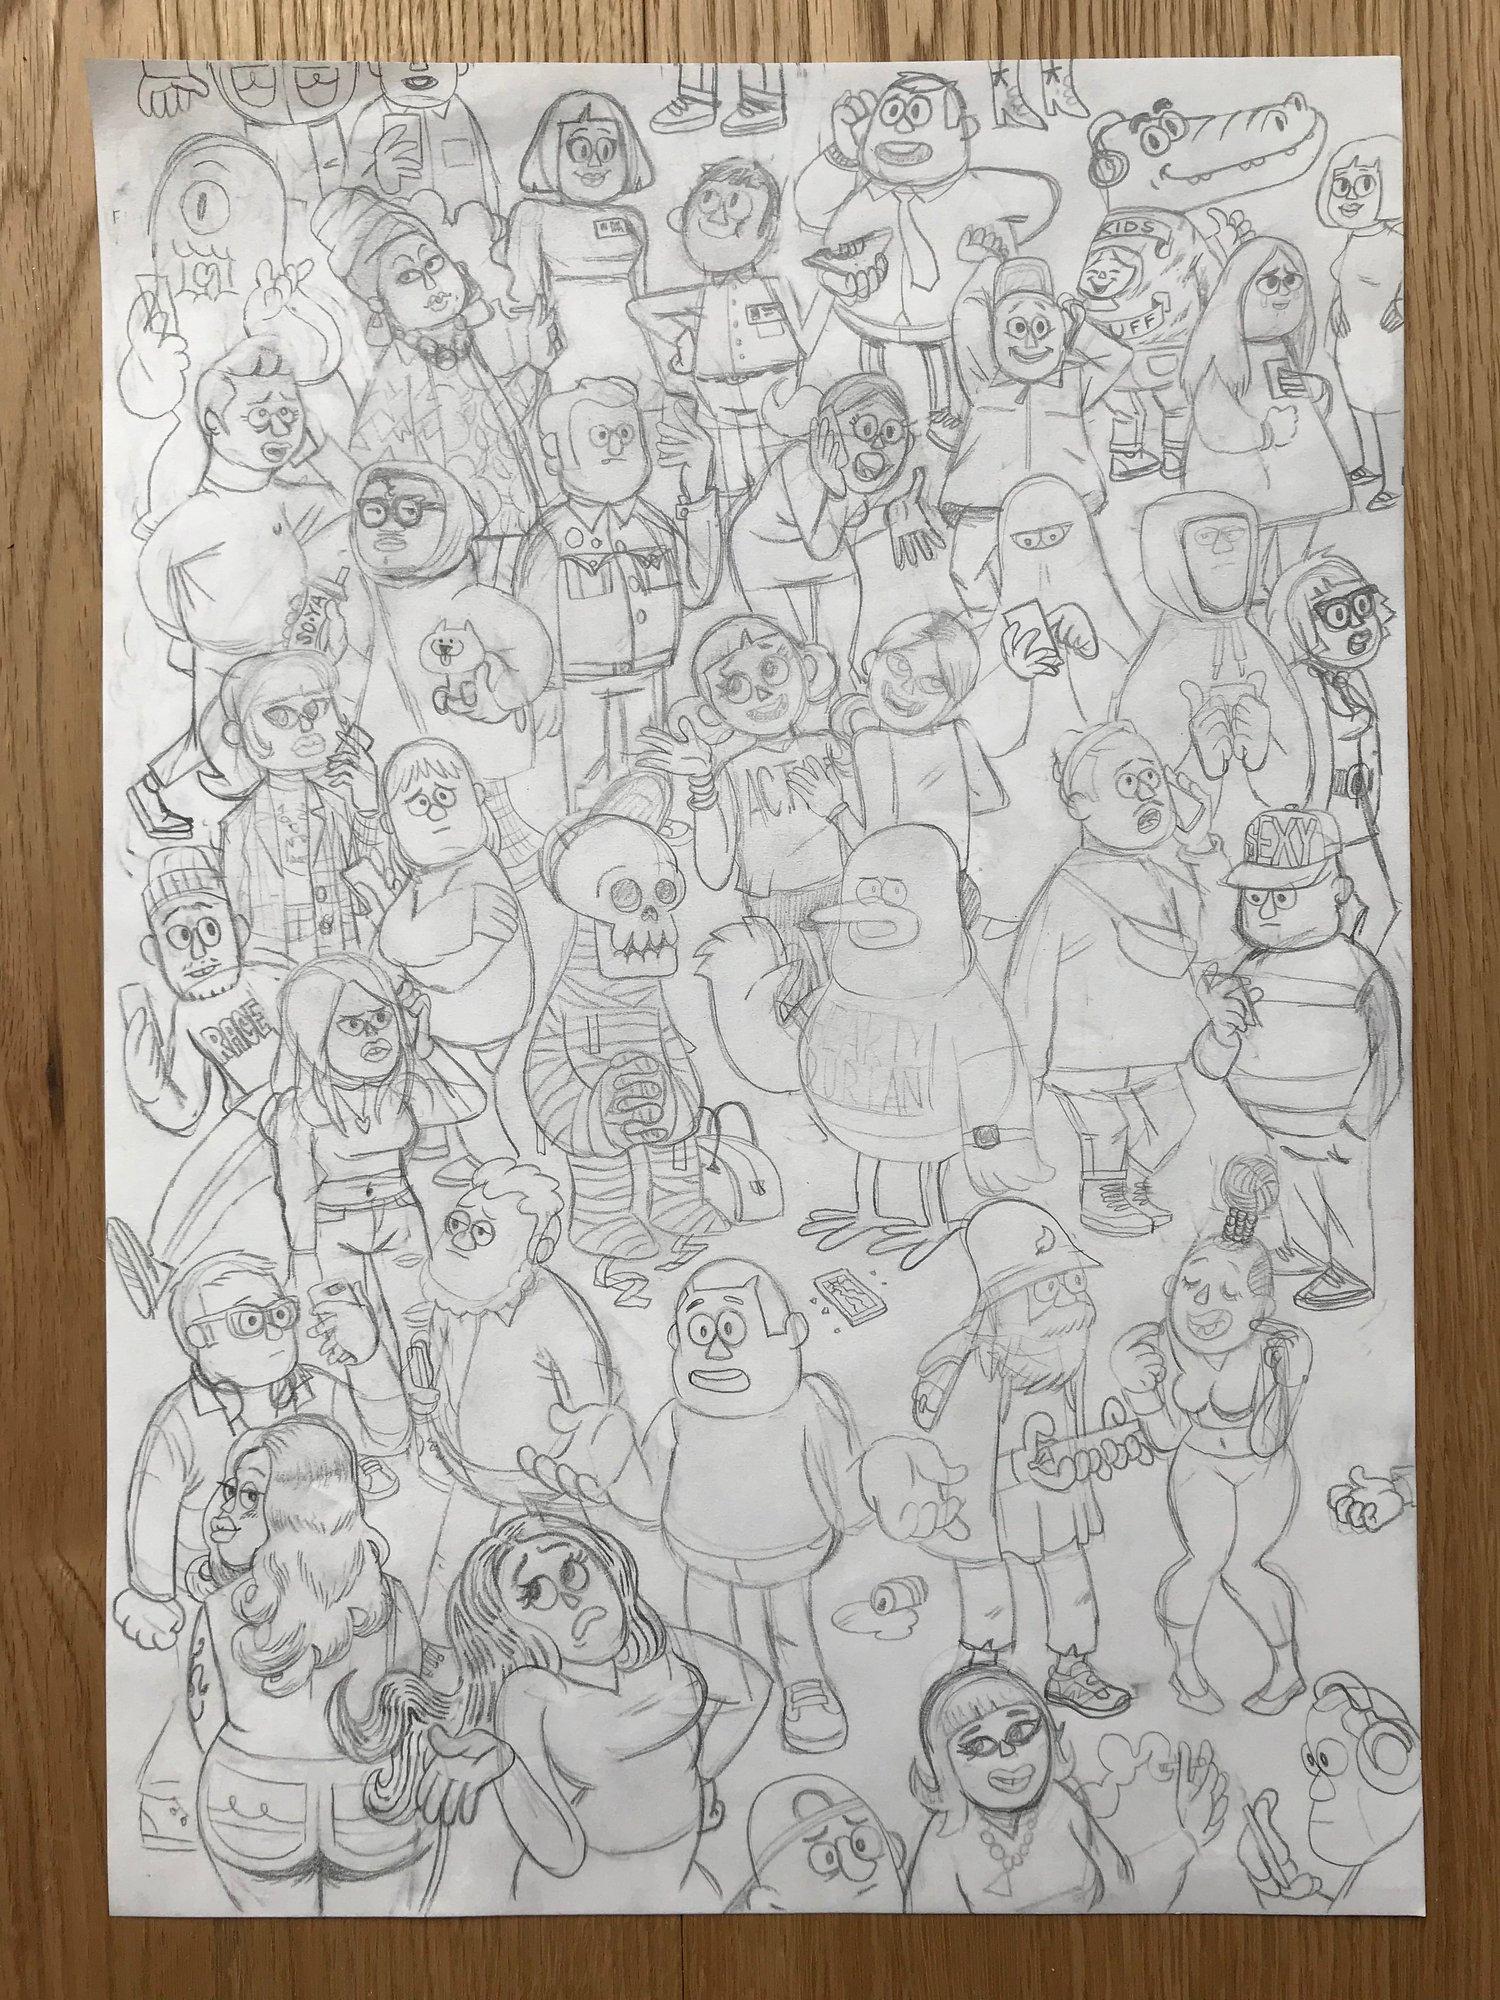 Image of Streetlife 1 Original, signed drawing